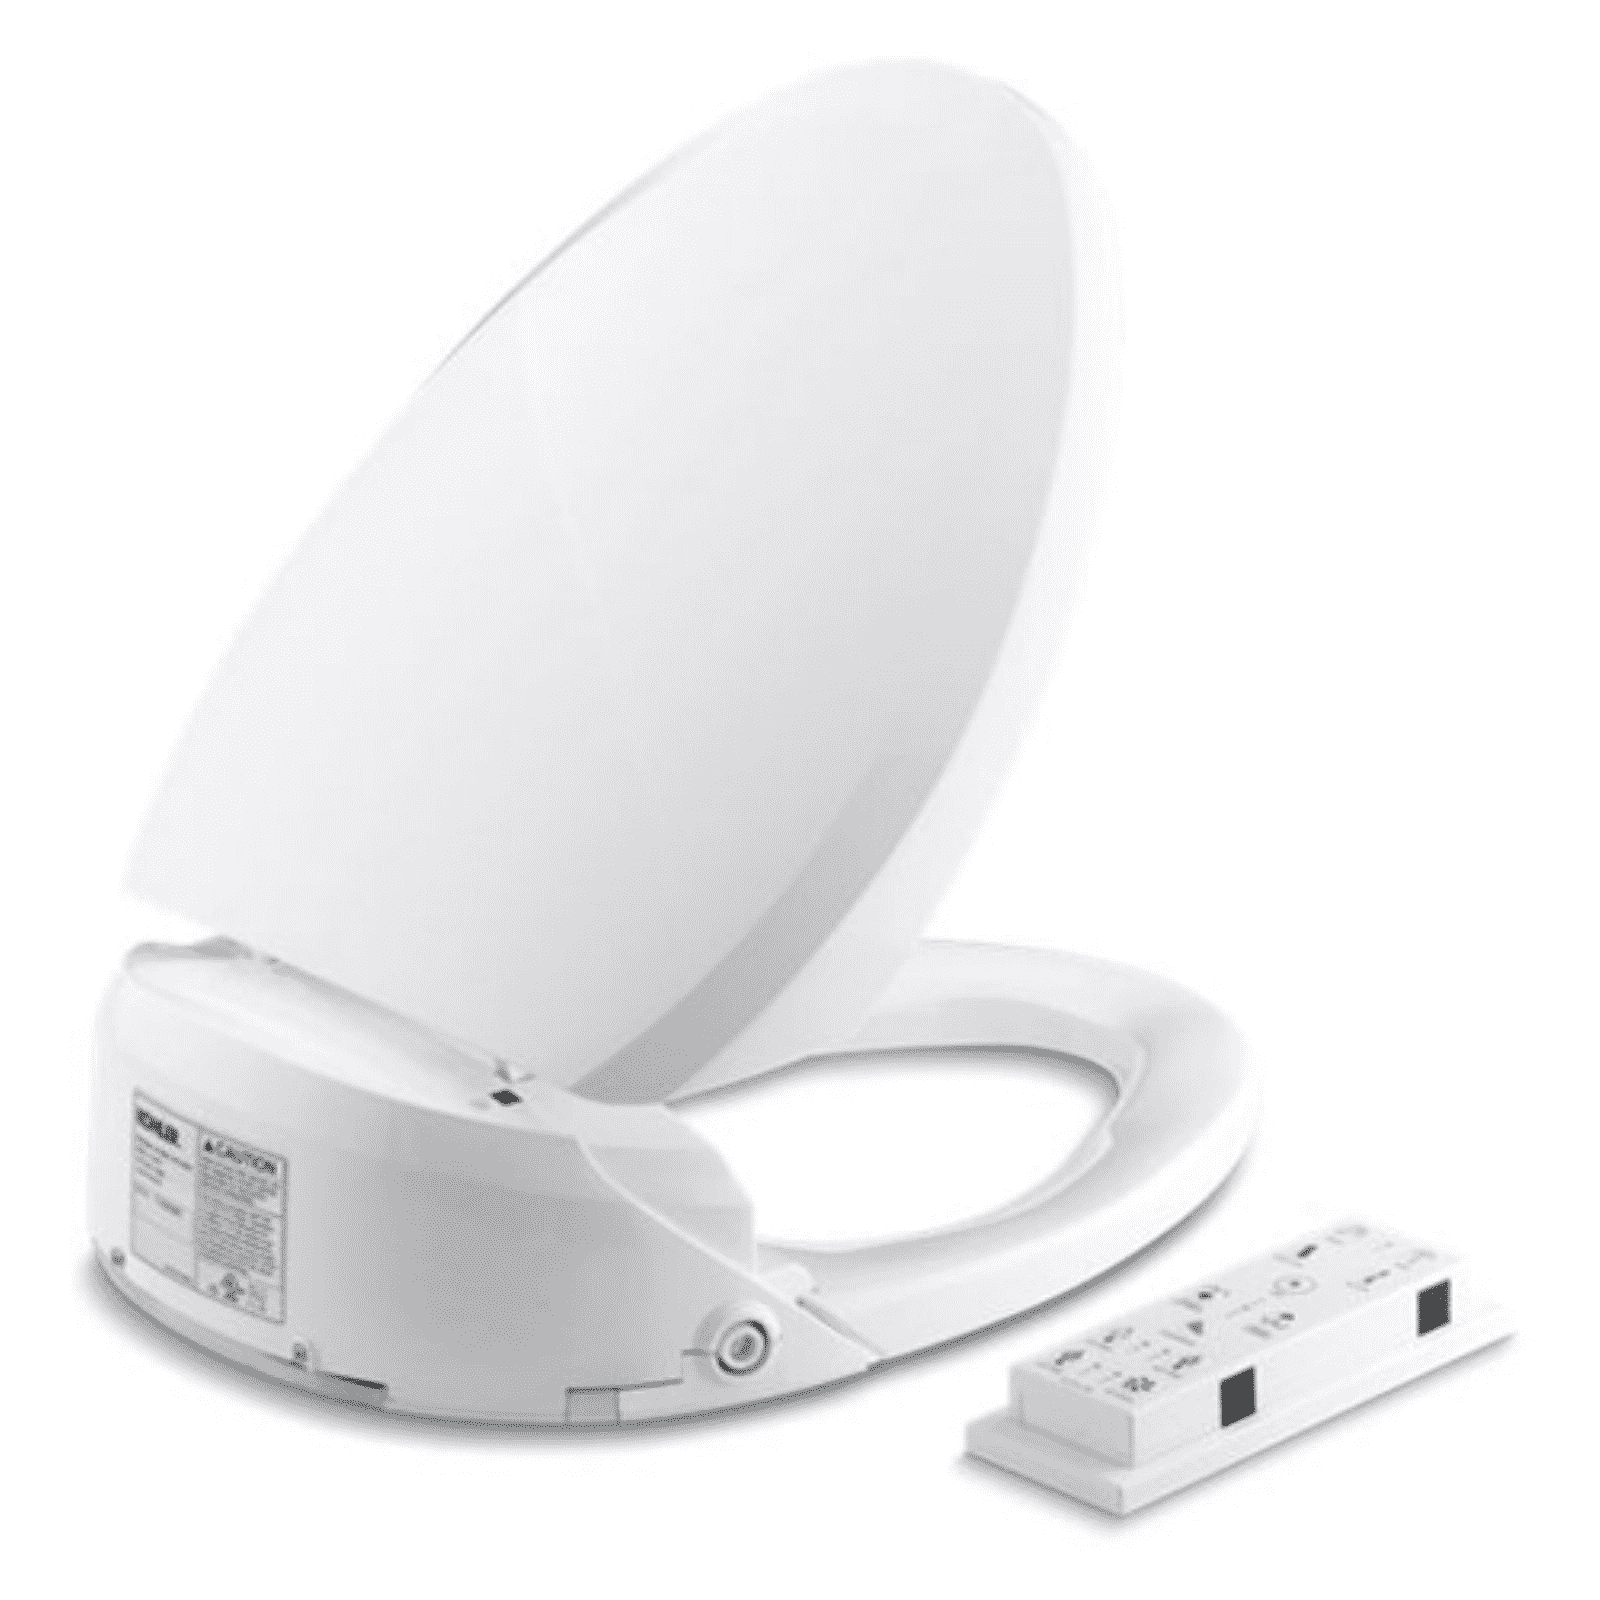 Super Kohler K 4744 White Elongated Toilet Seat With Bidet Functionality Inzonedesignstudio Interior Chair Design Inzonedesignstudiocom